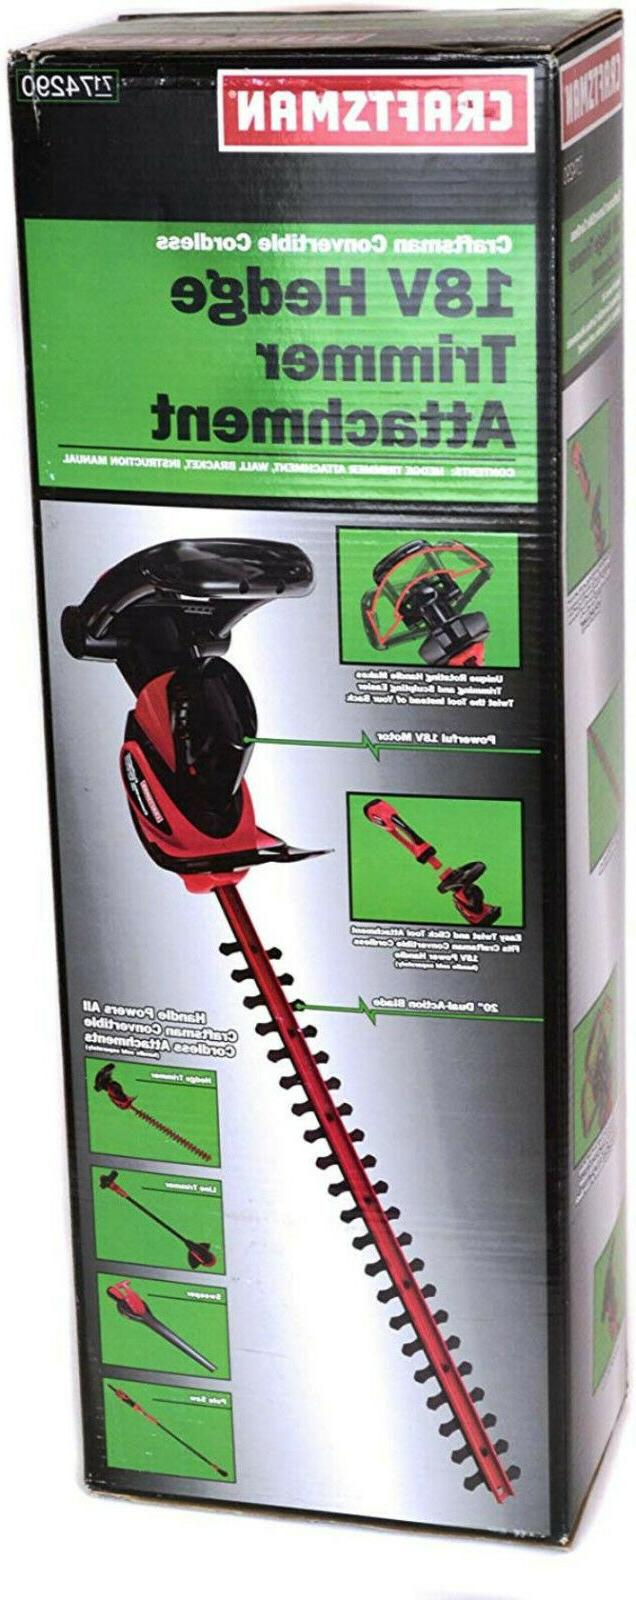 Craftsman 71-74290 18V Convertible Cordless Hedge Trimmer us